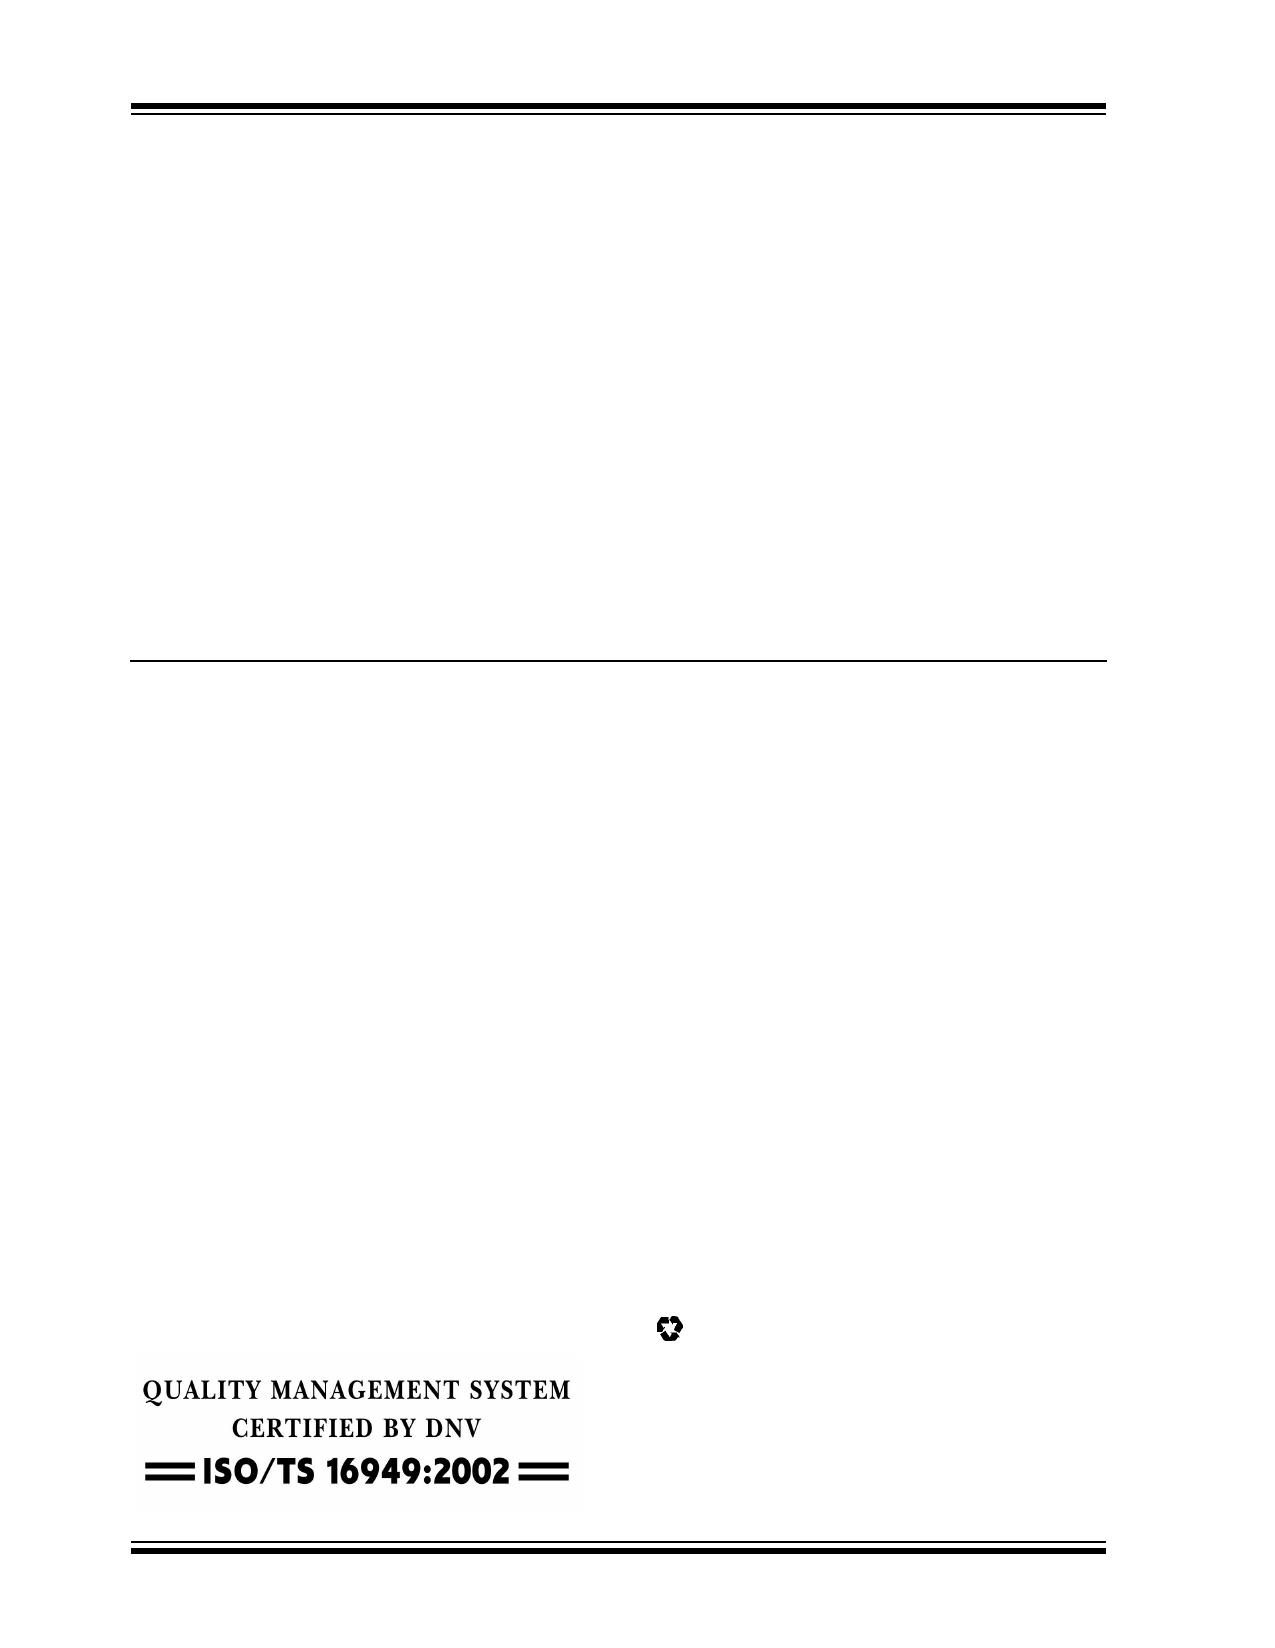 12F635 pdf schematic